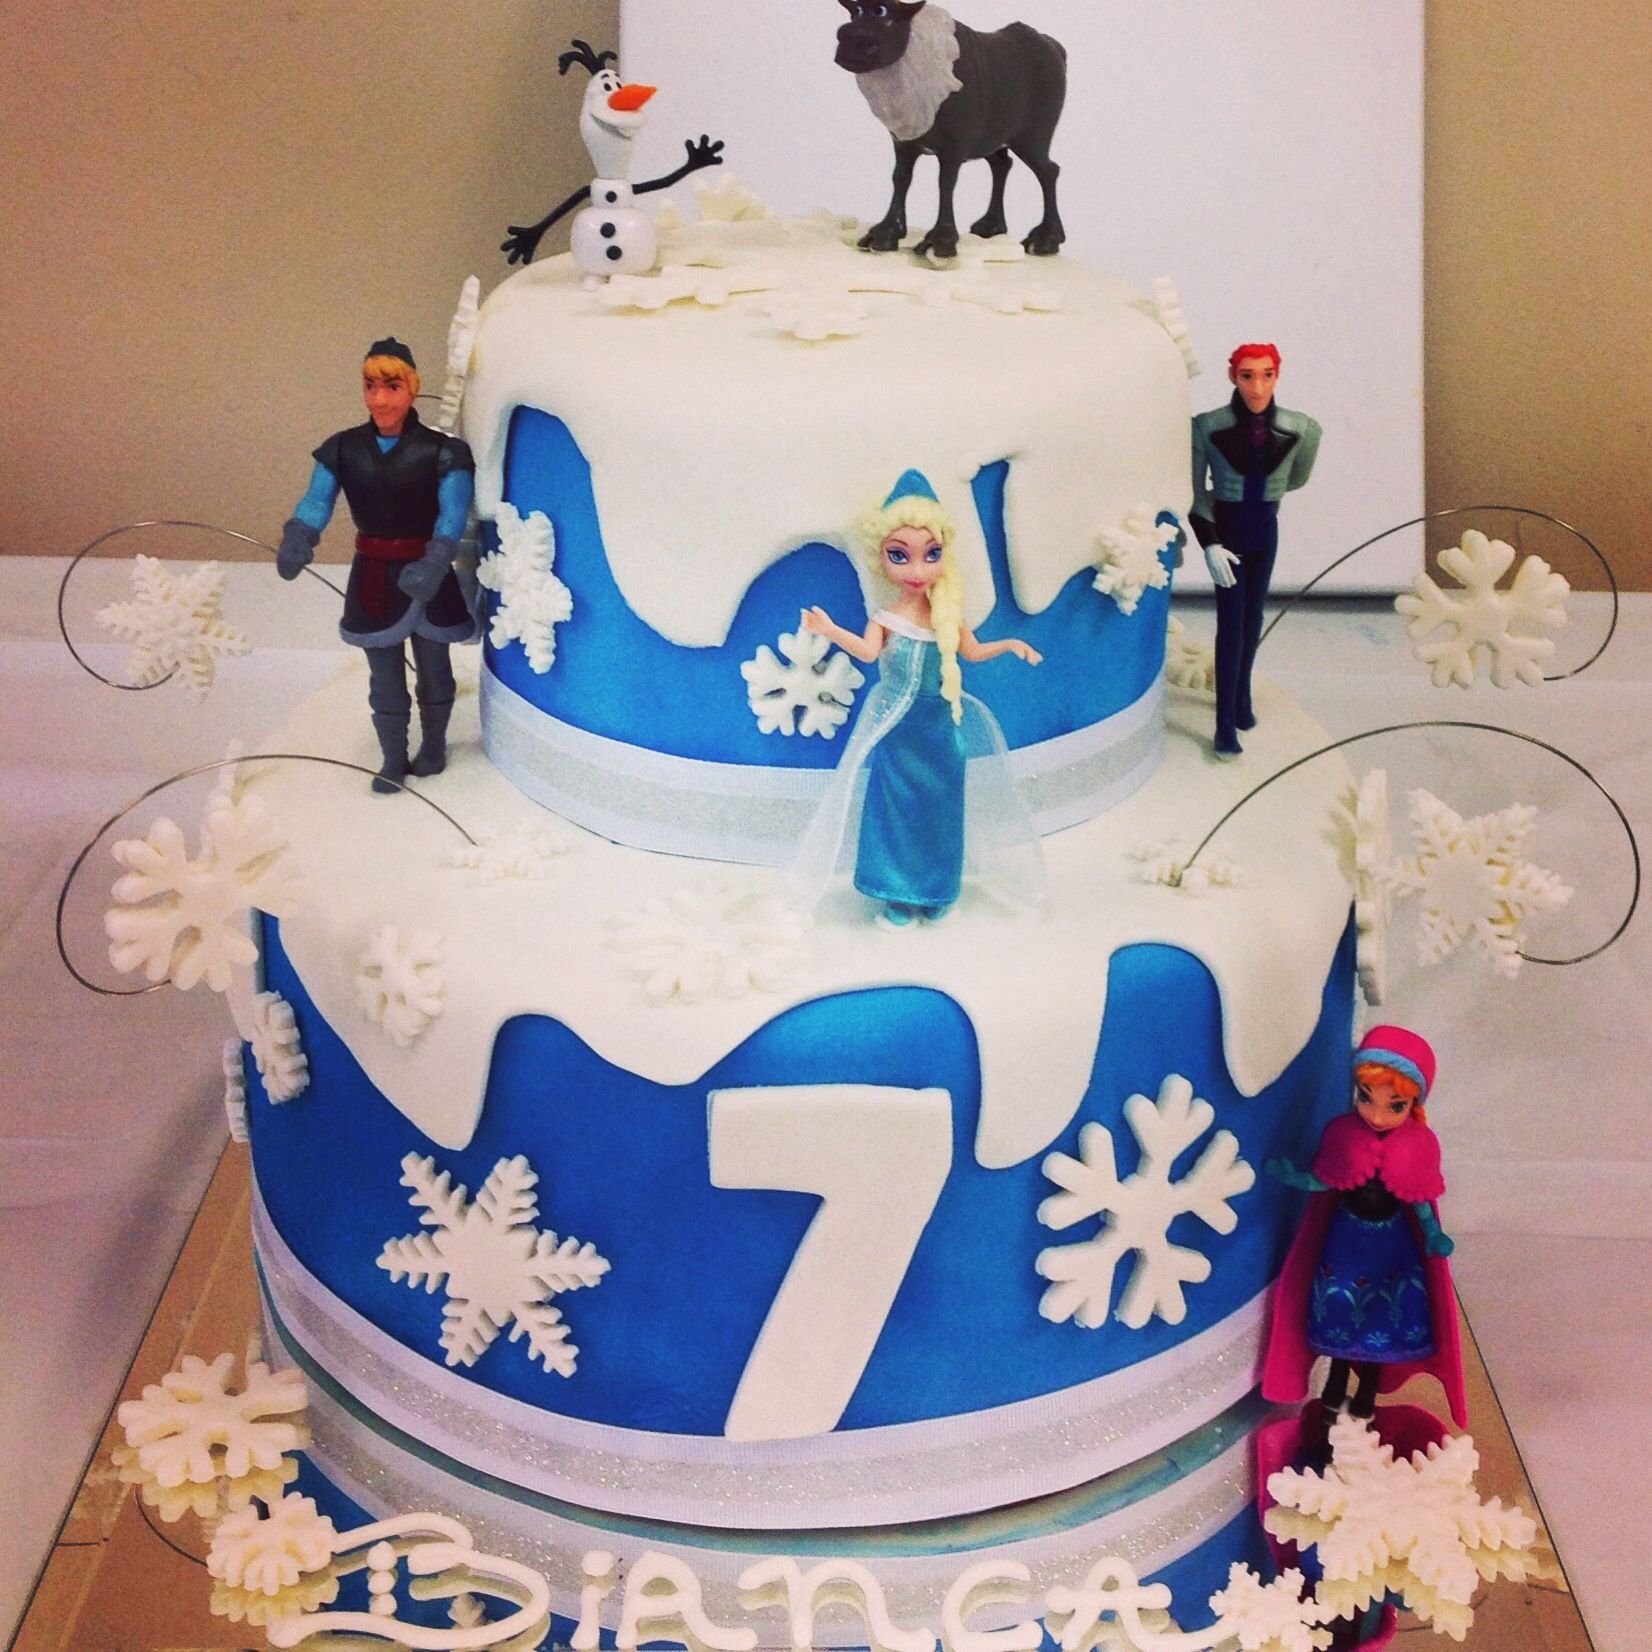 Cake Decorating Frozen Movie : Frozen Movie Cake Ideas 88669 Cakes For The Movie Frozen P